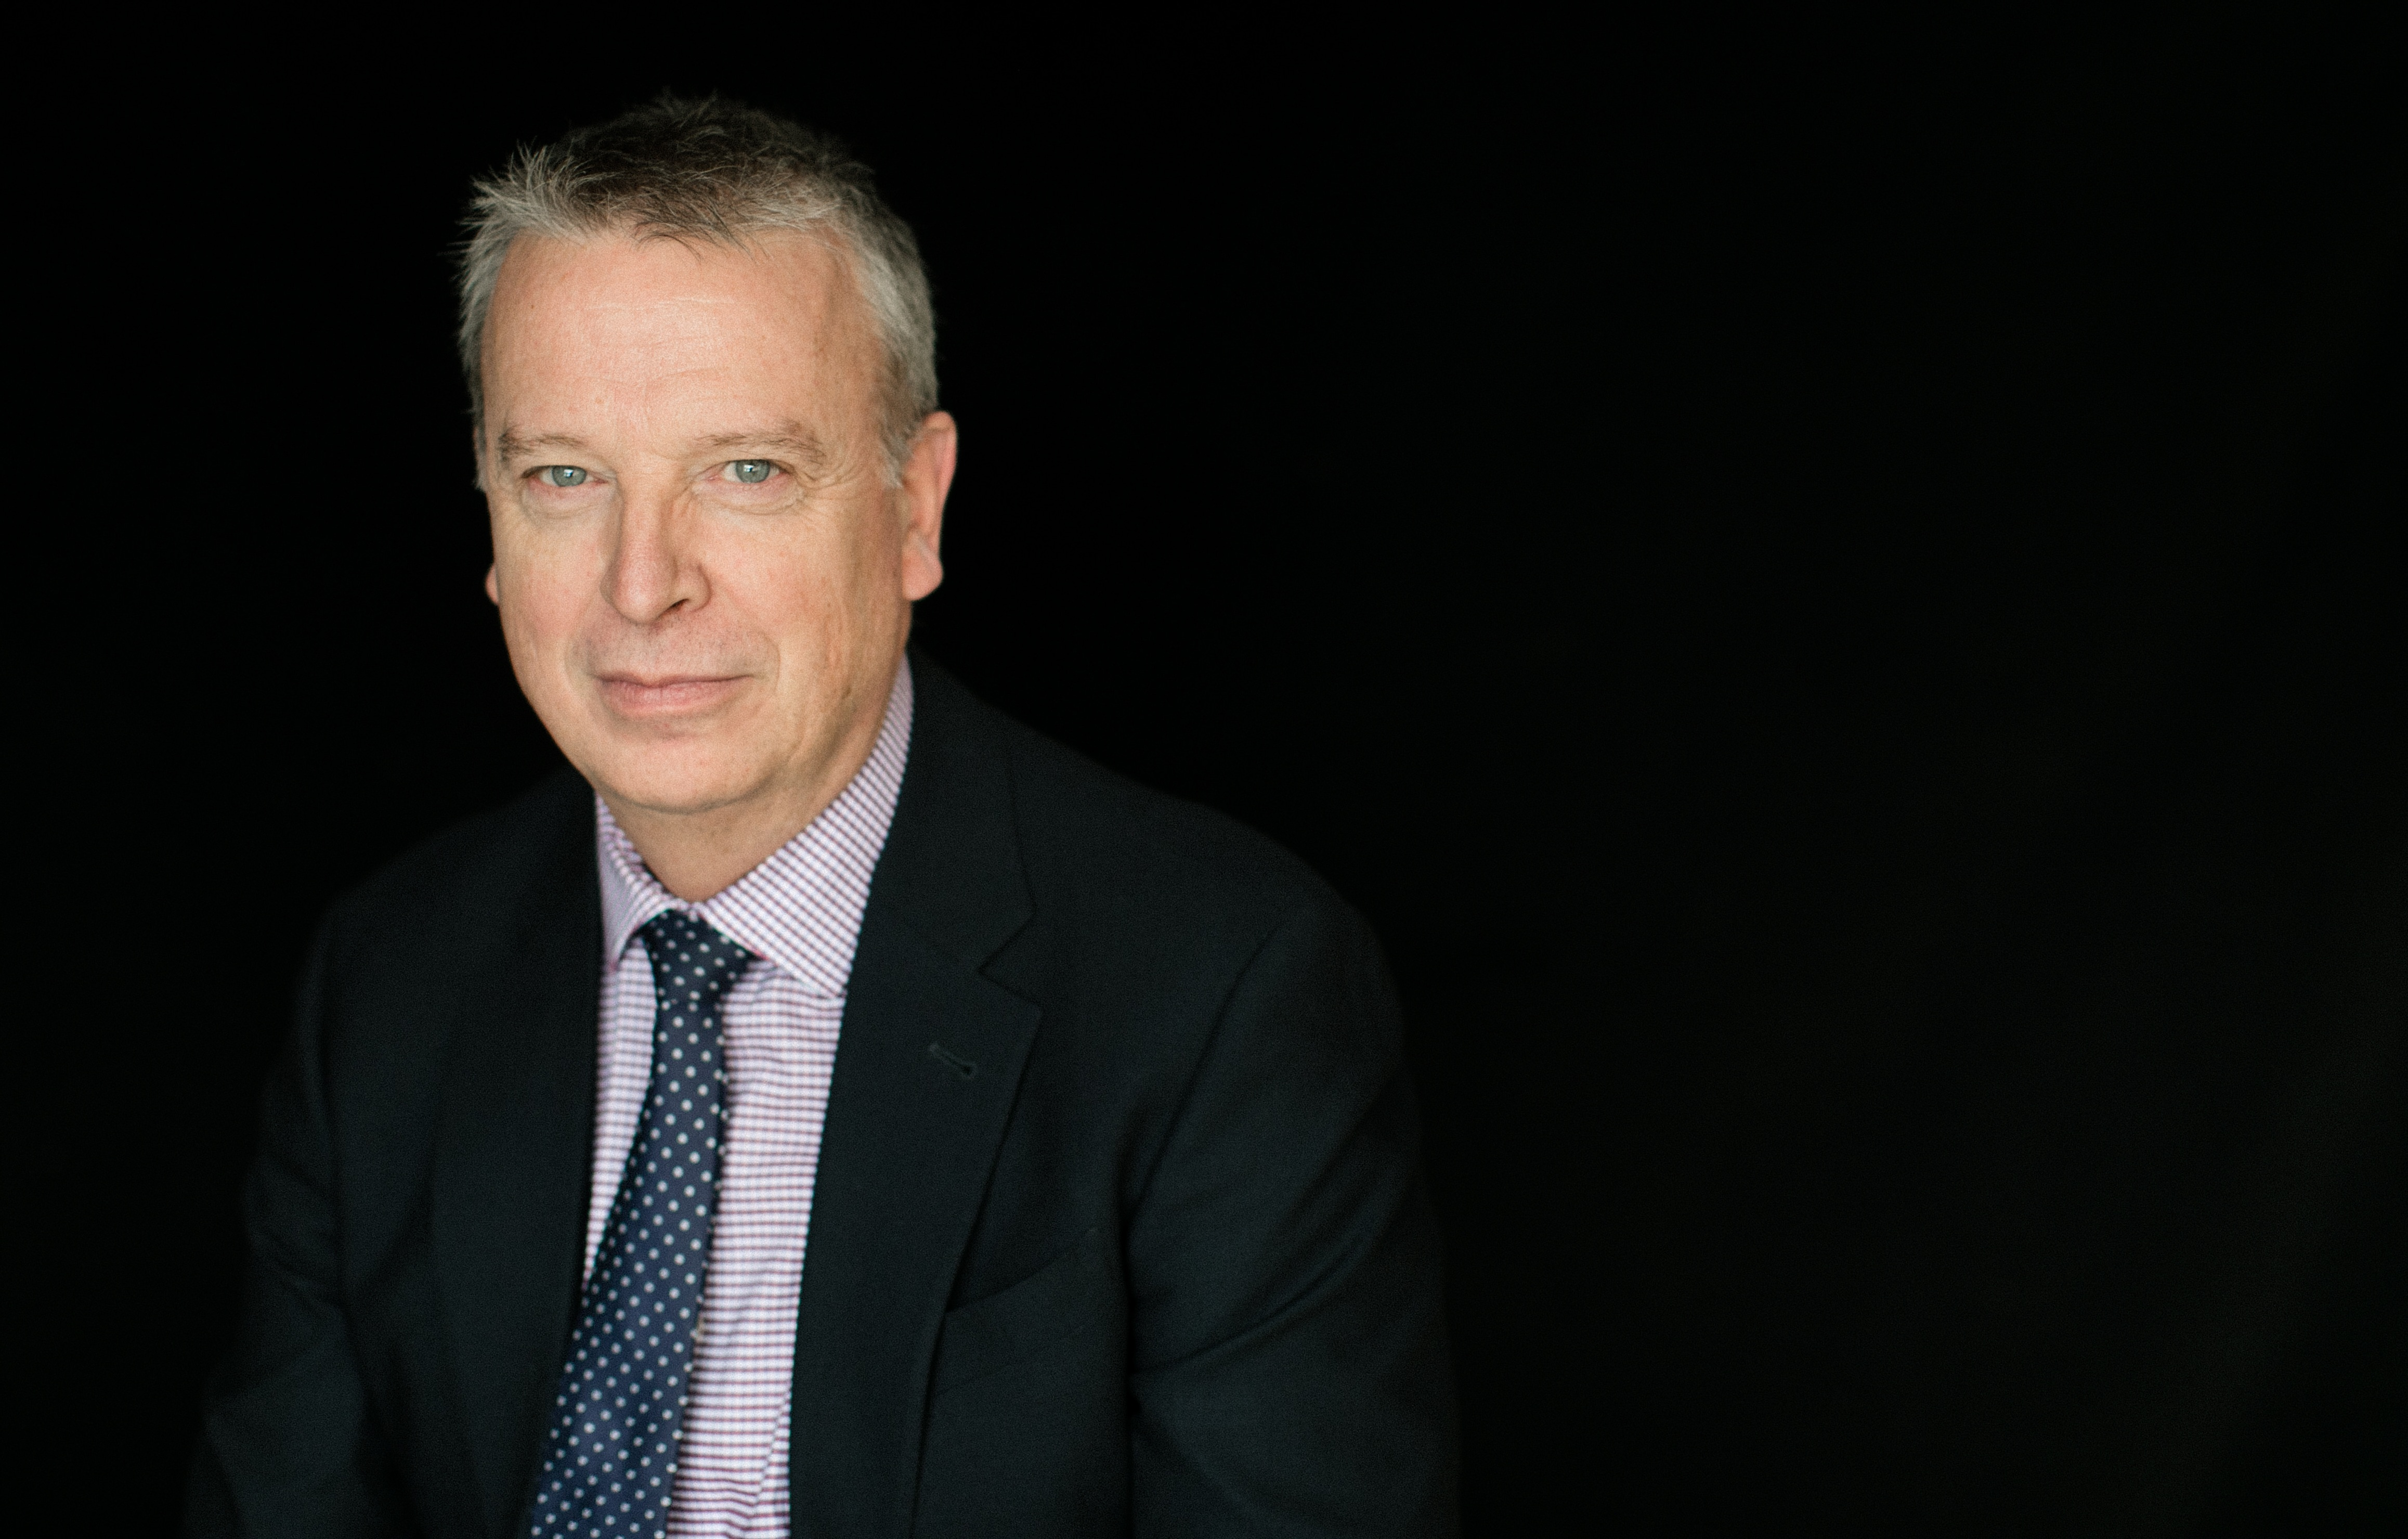 John Stephenson, President and CEO